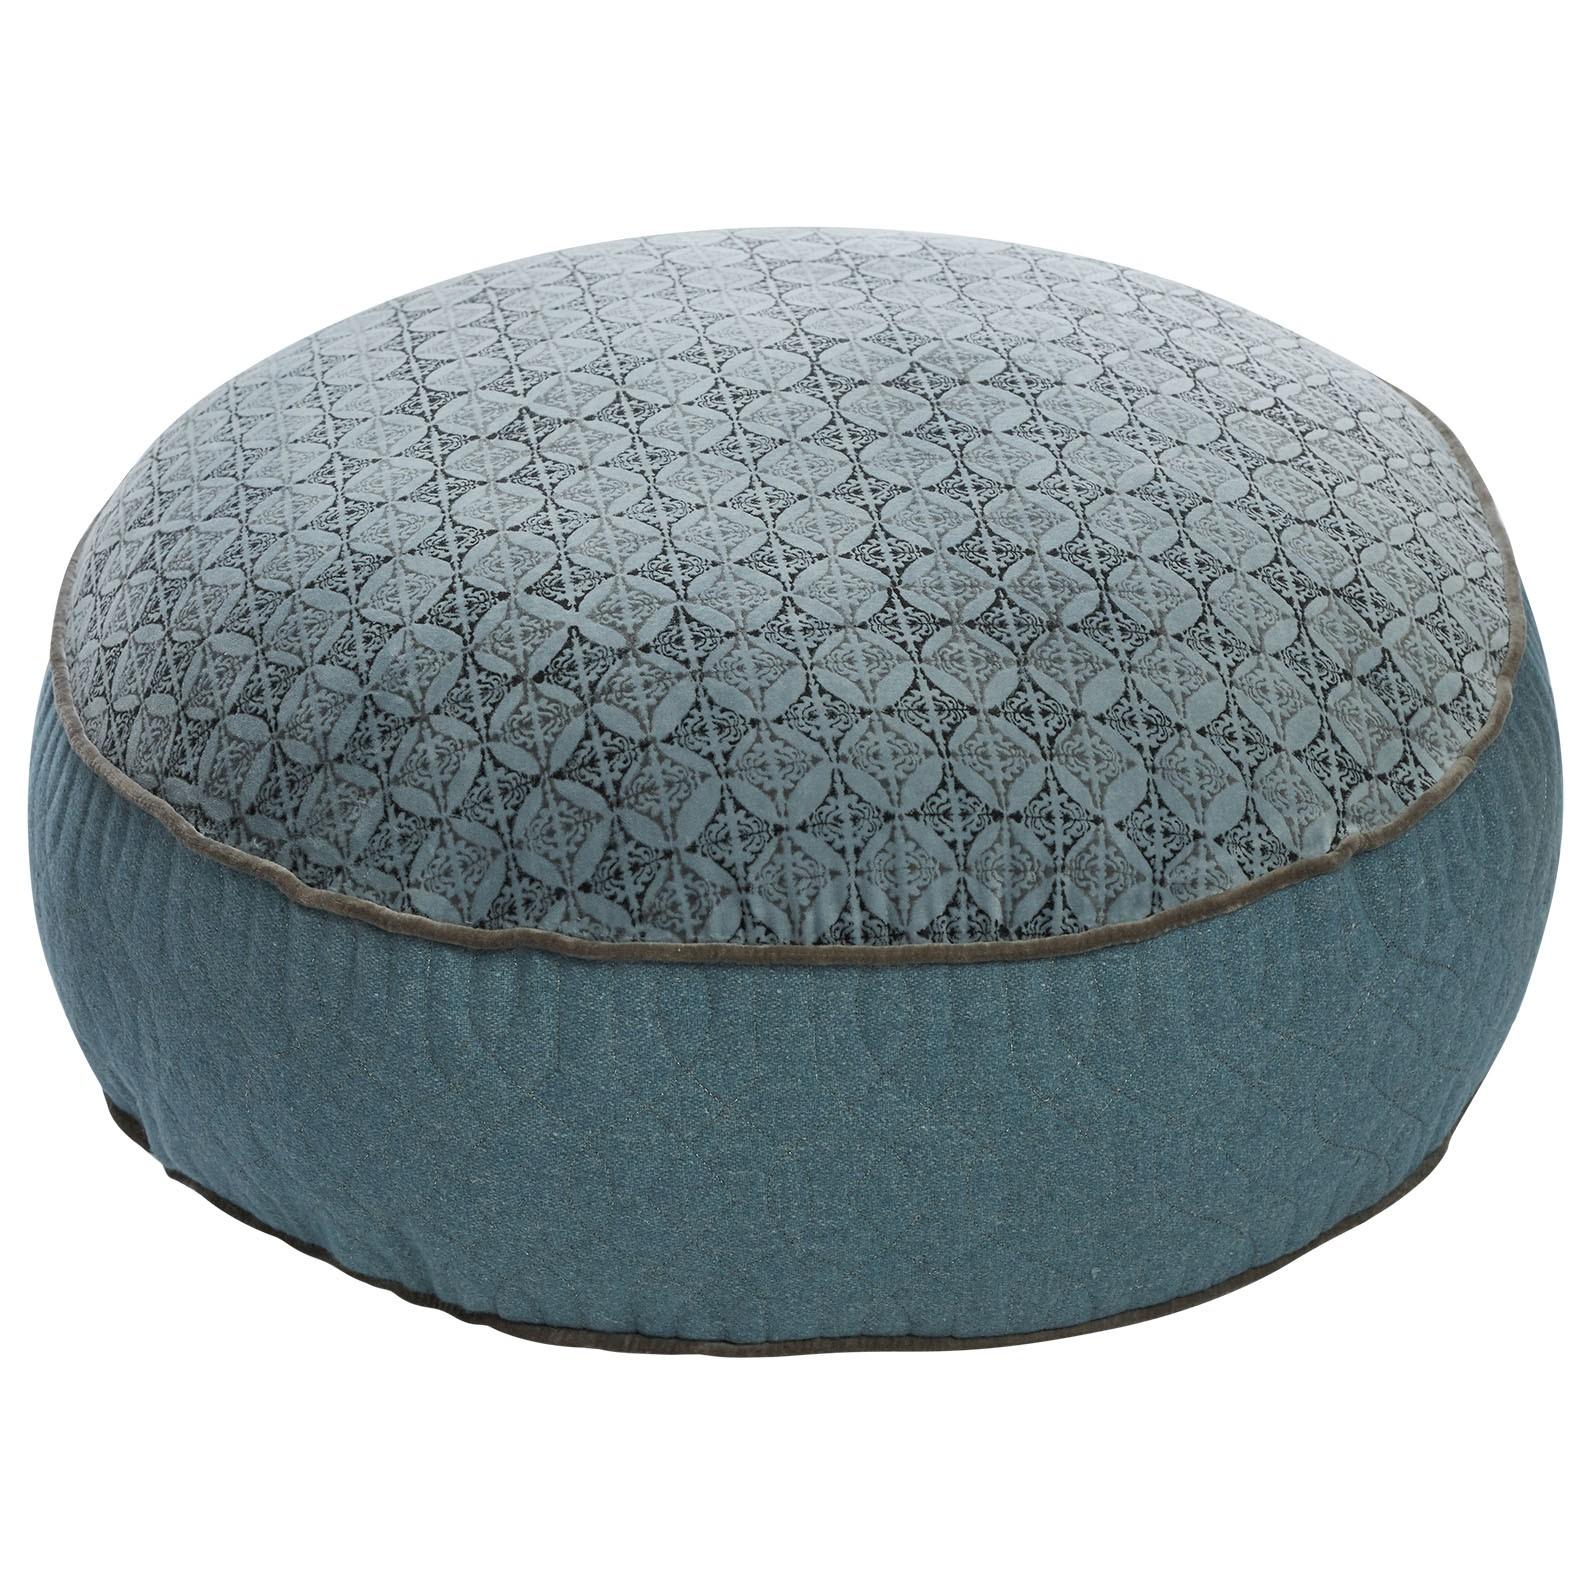 norfolk byron floor cushion -